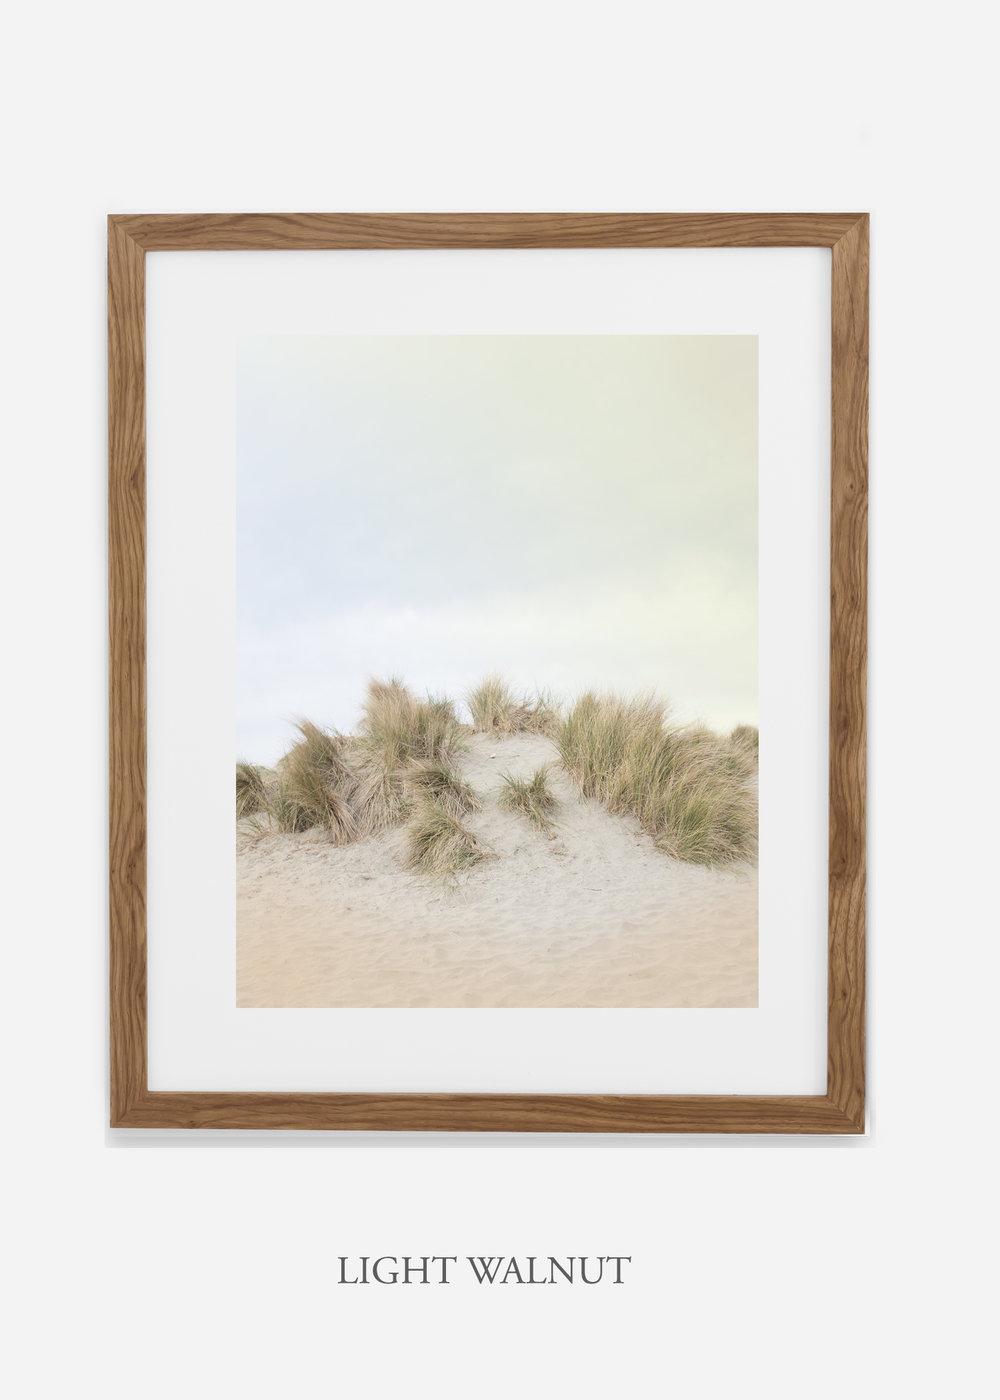 DunesNo.2_lightwalnut_BigSur_Ocean_Beach__Art_Photography_interiordesign_bohemian_cactusart.jpg